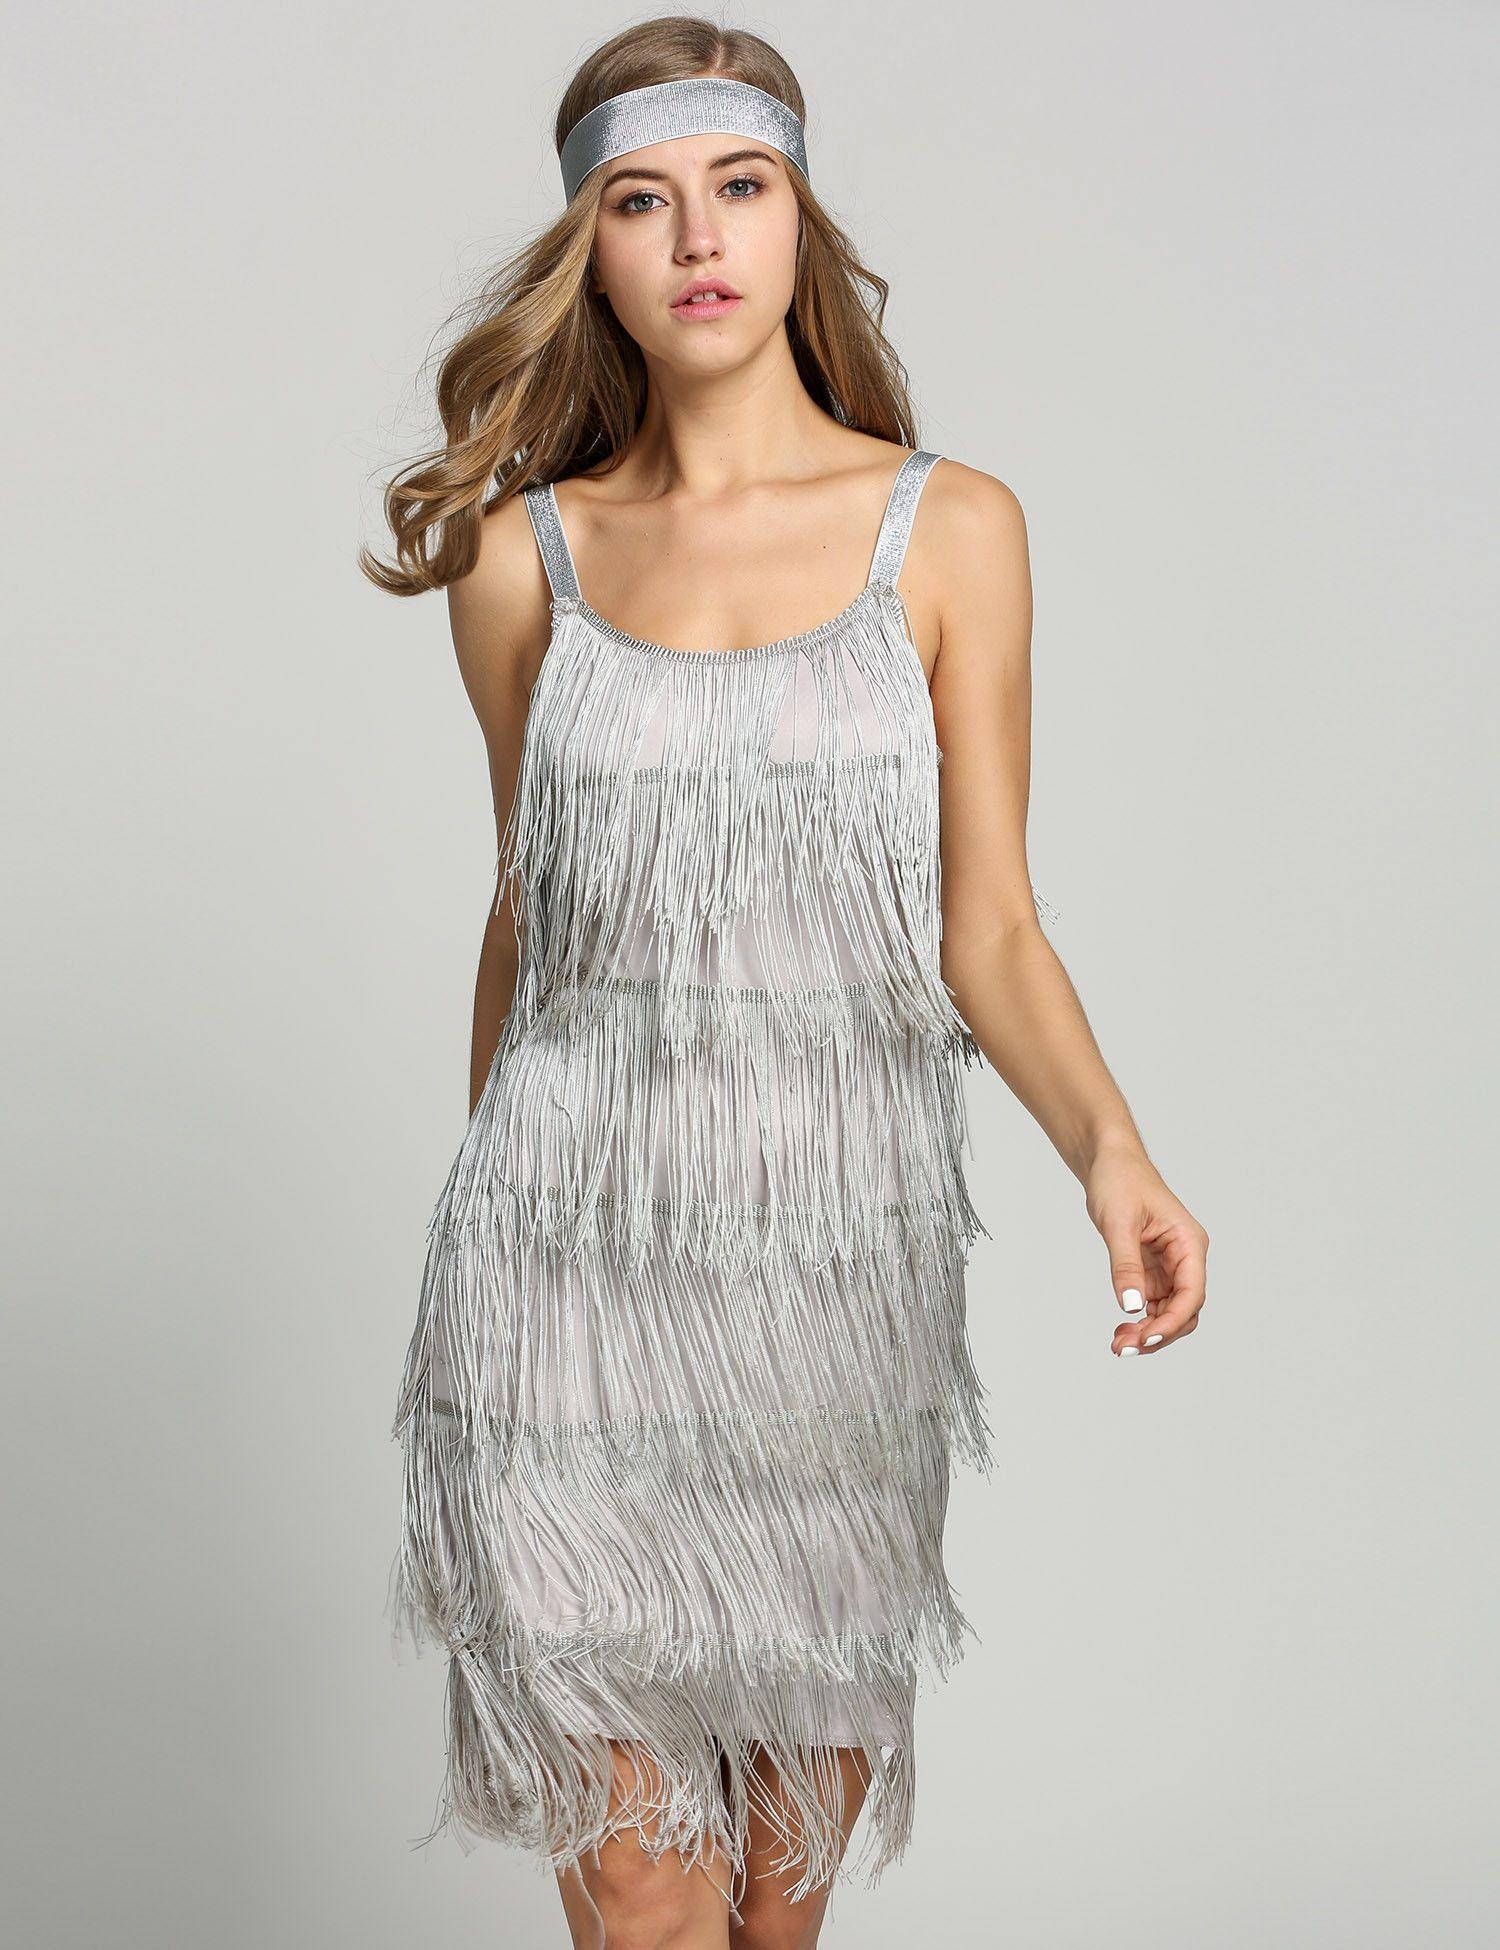 1920s Straps Tassels Glam Gatsby Fringe Flapper Belted Party Dresses